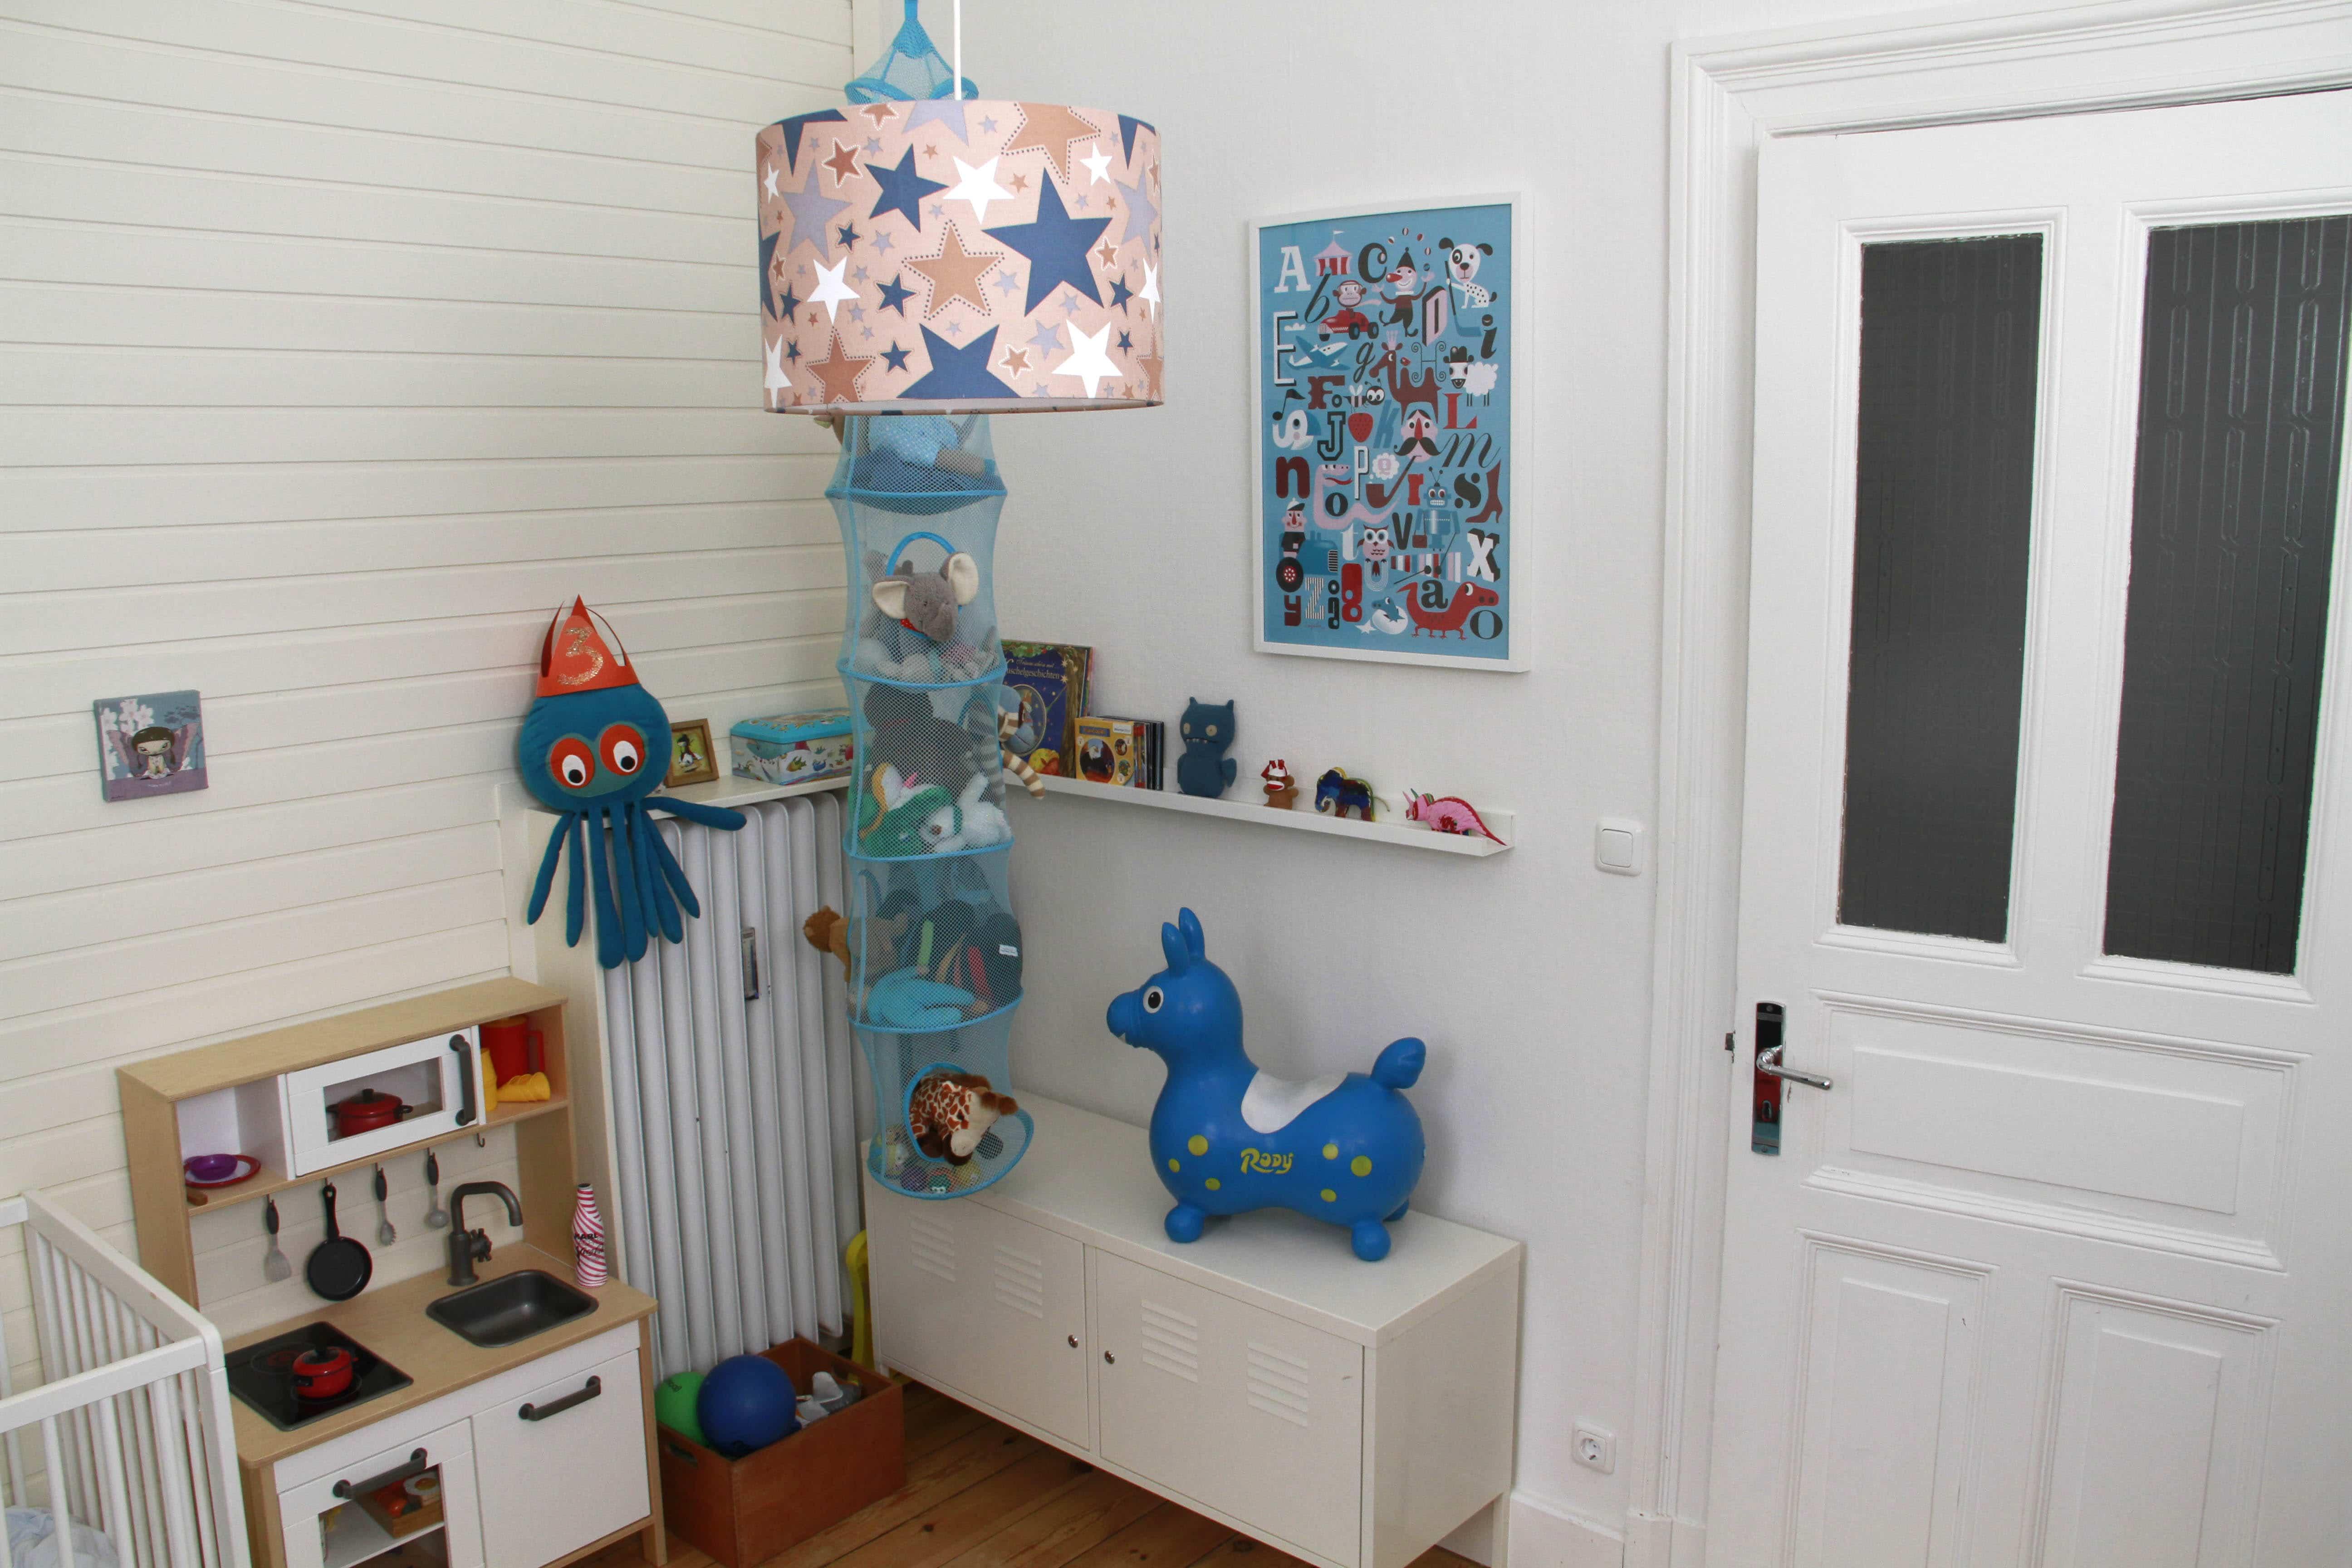 homestory willkommen in mamaclevers weltraumzimmer. Black Bedroom Furniture Sets. Home Design Ideas